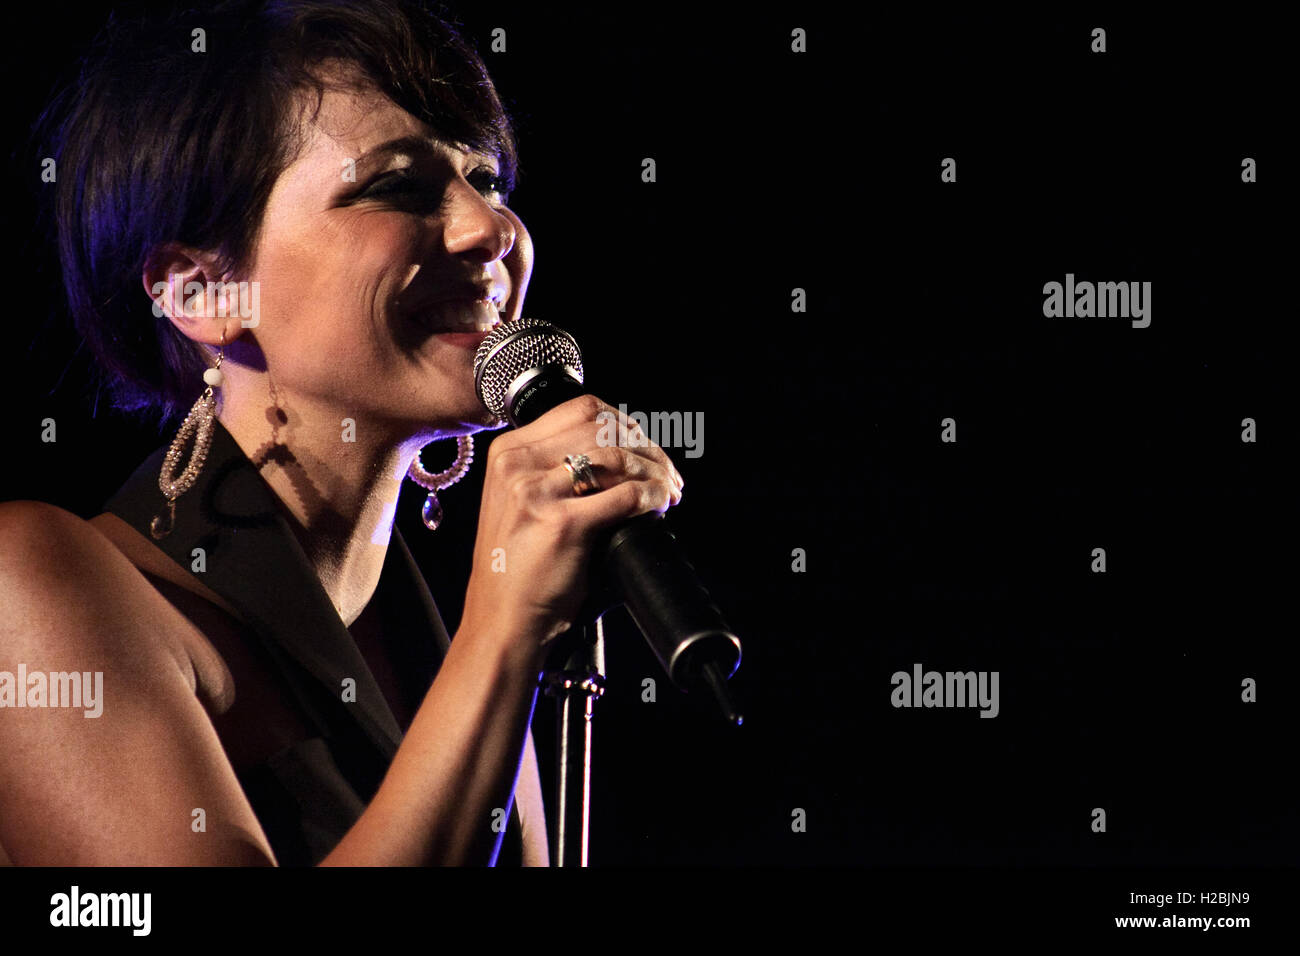 "Italian jazz singer Simona Molinari performs live during her tour ""Loving Ella"". Stock Photo"